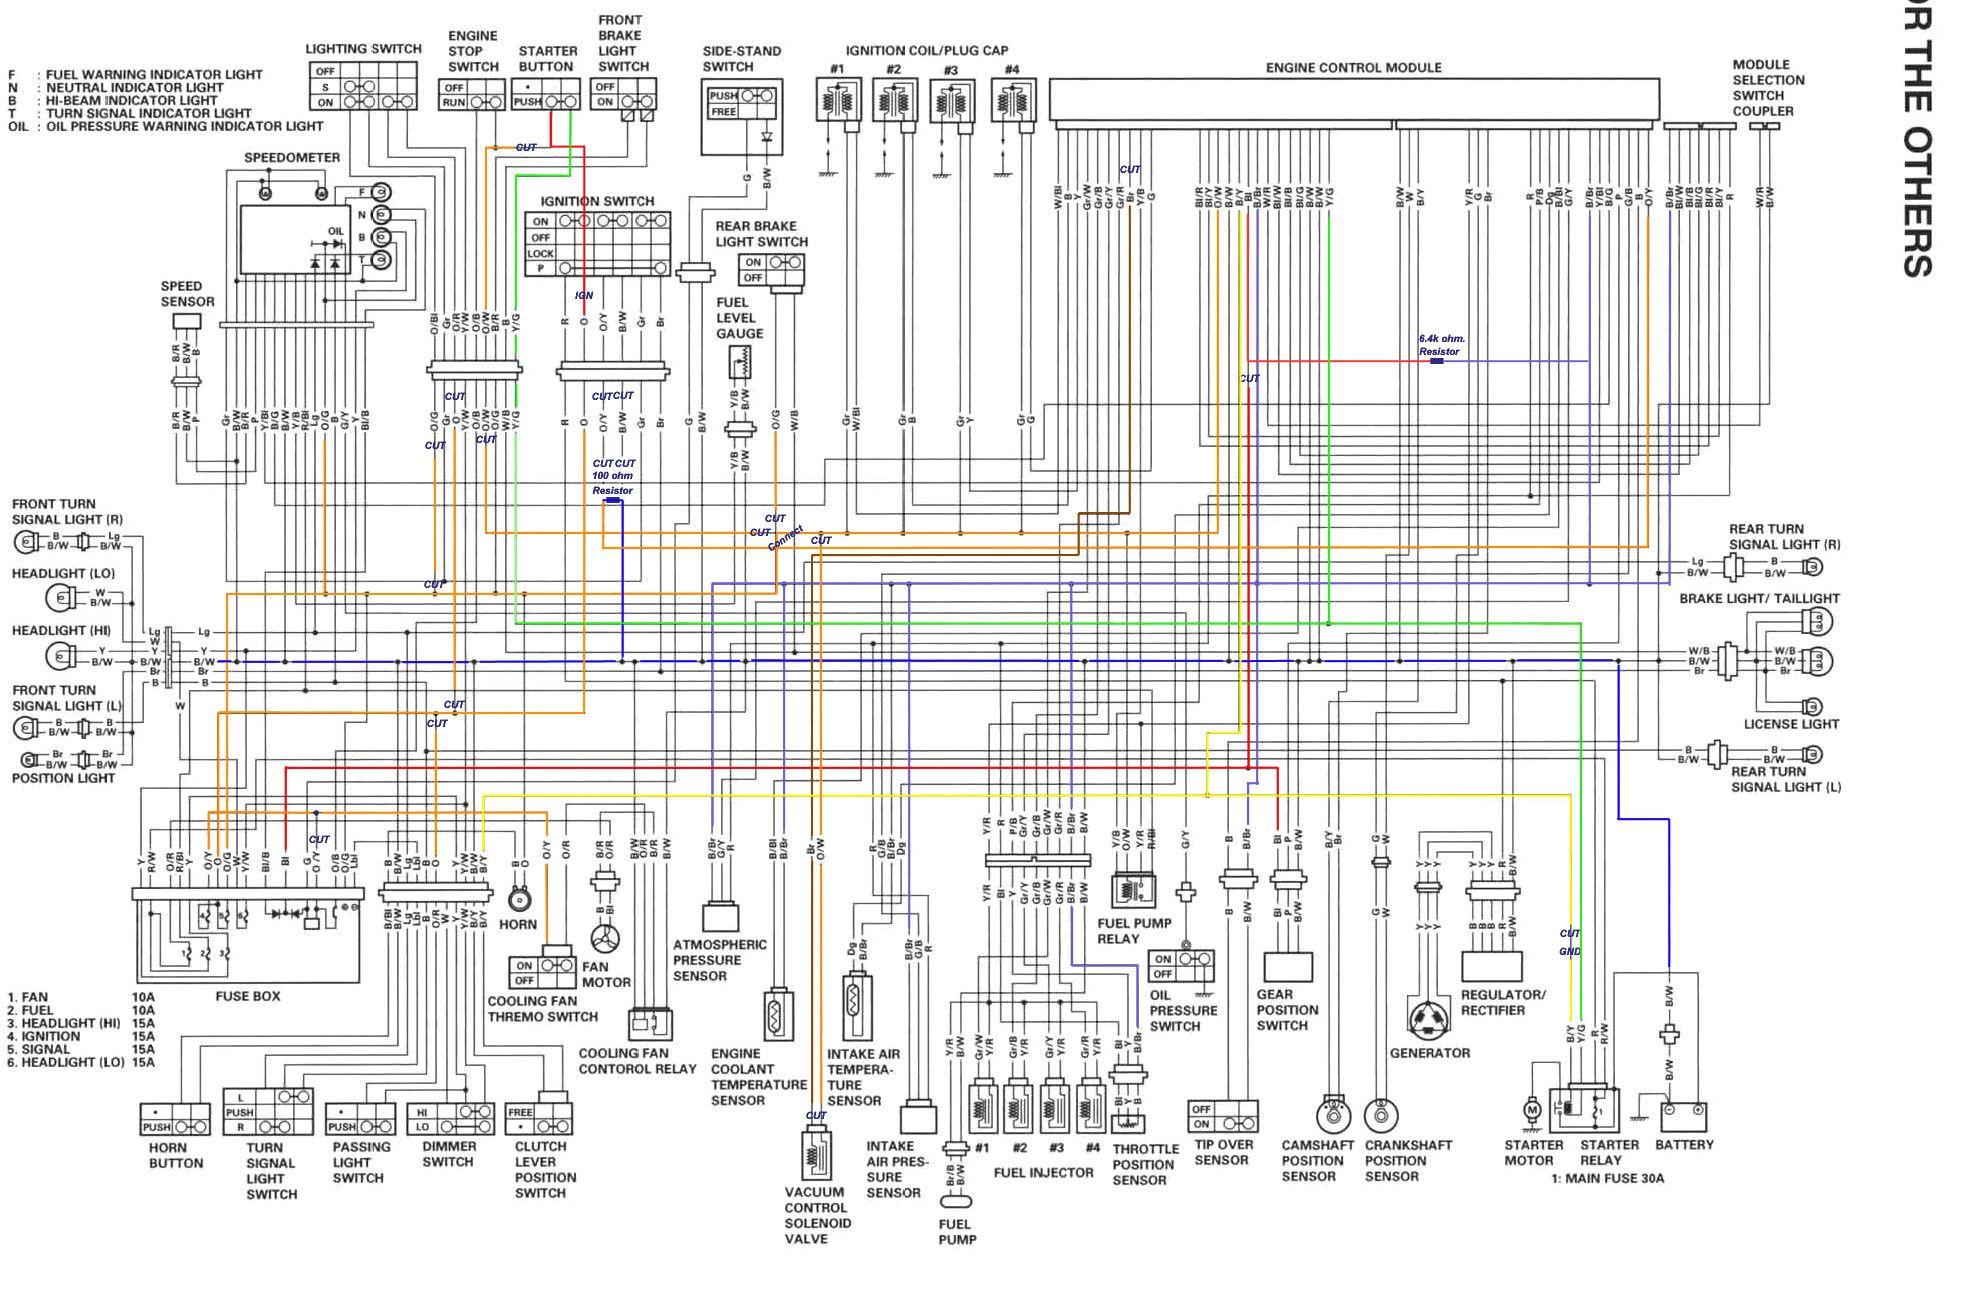 Gsxr1300k8 Electrik Diagram